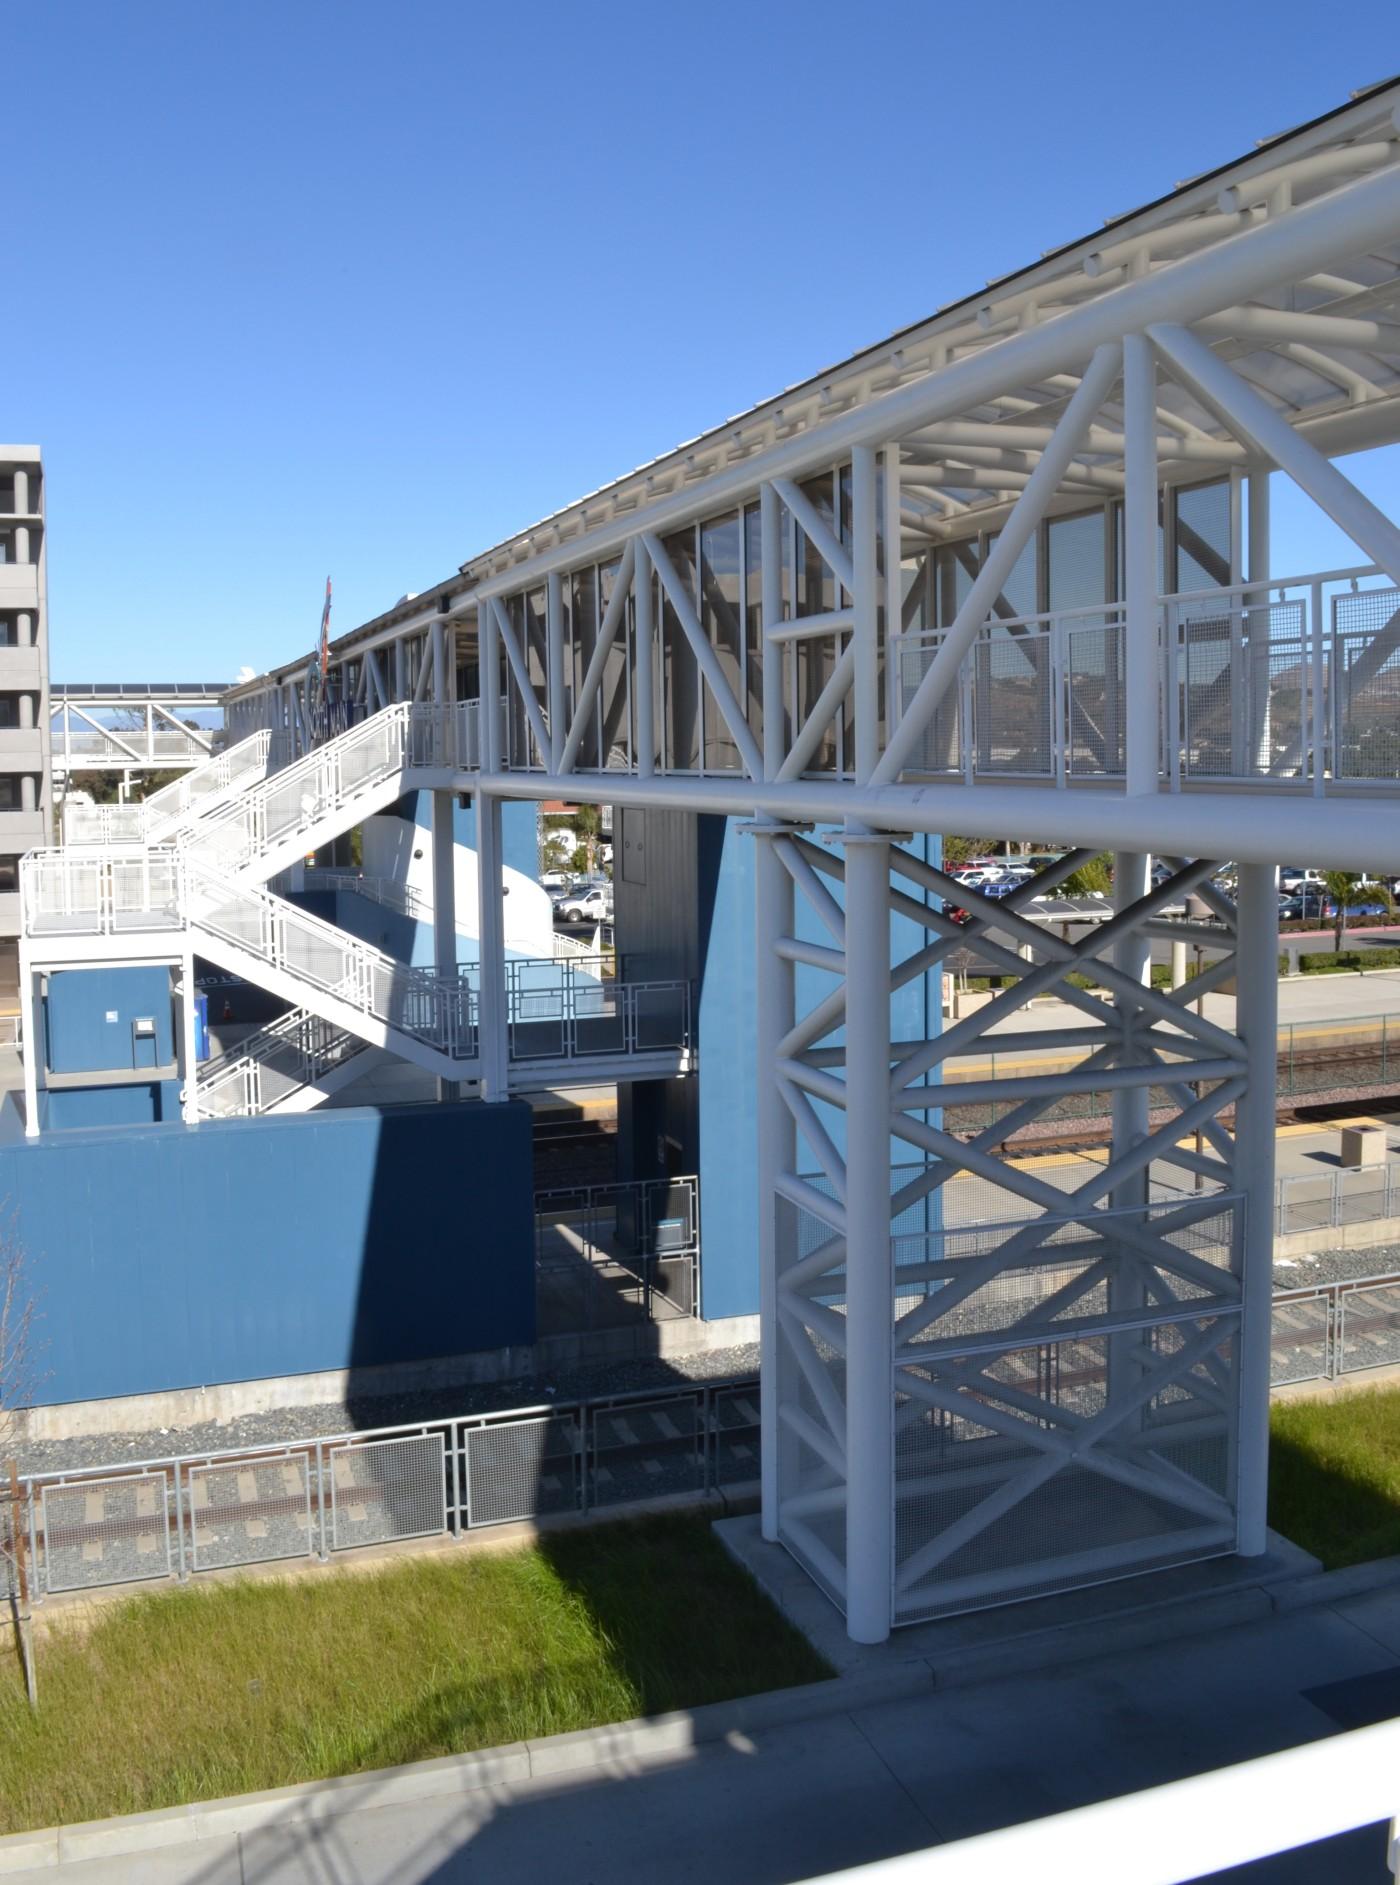 coronatransit5-Stationbridge